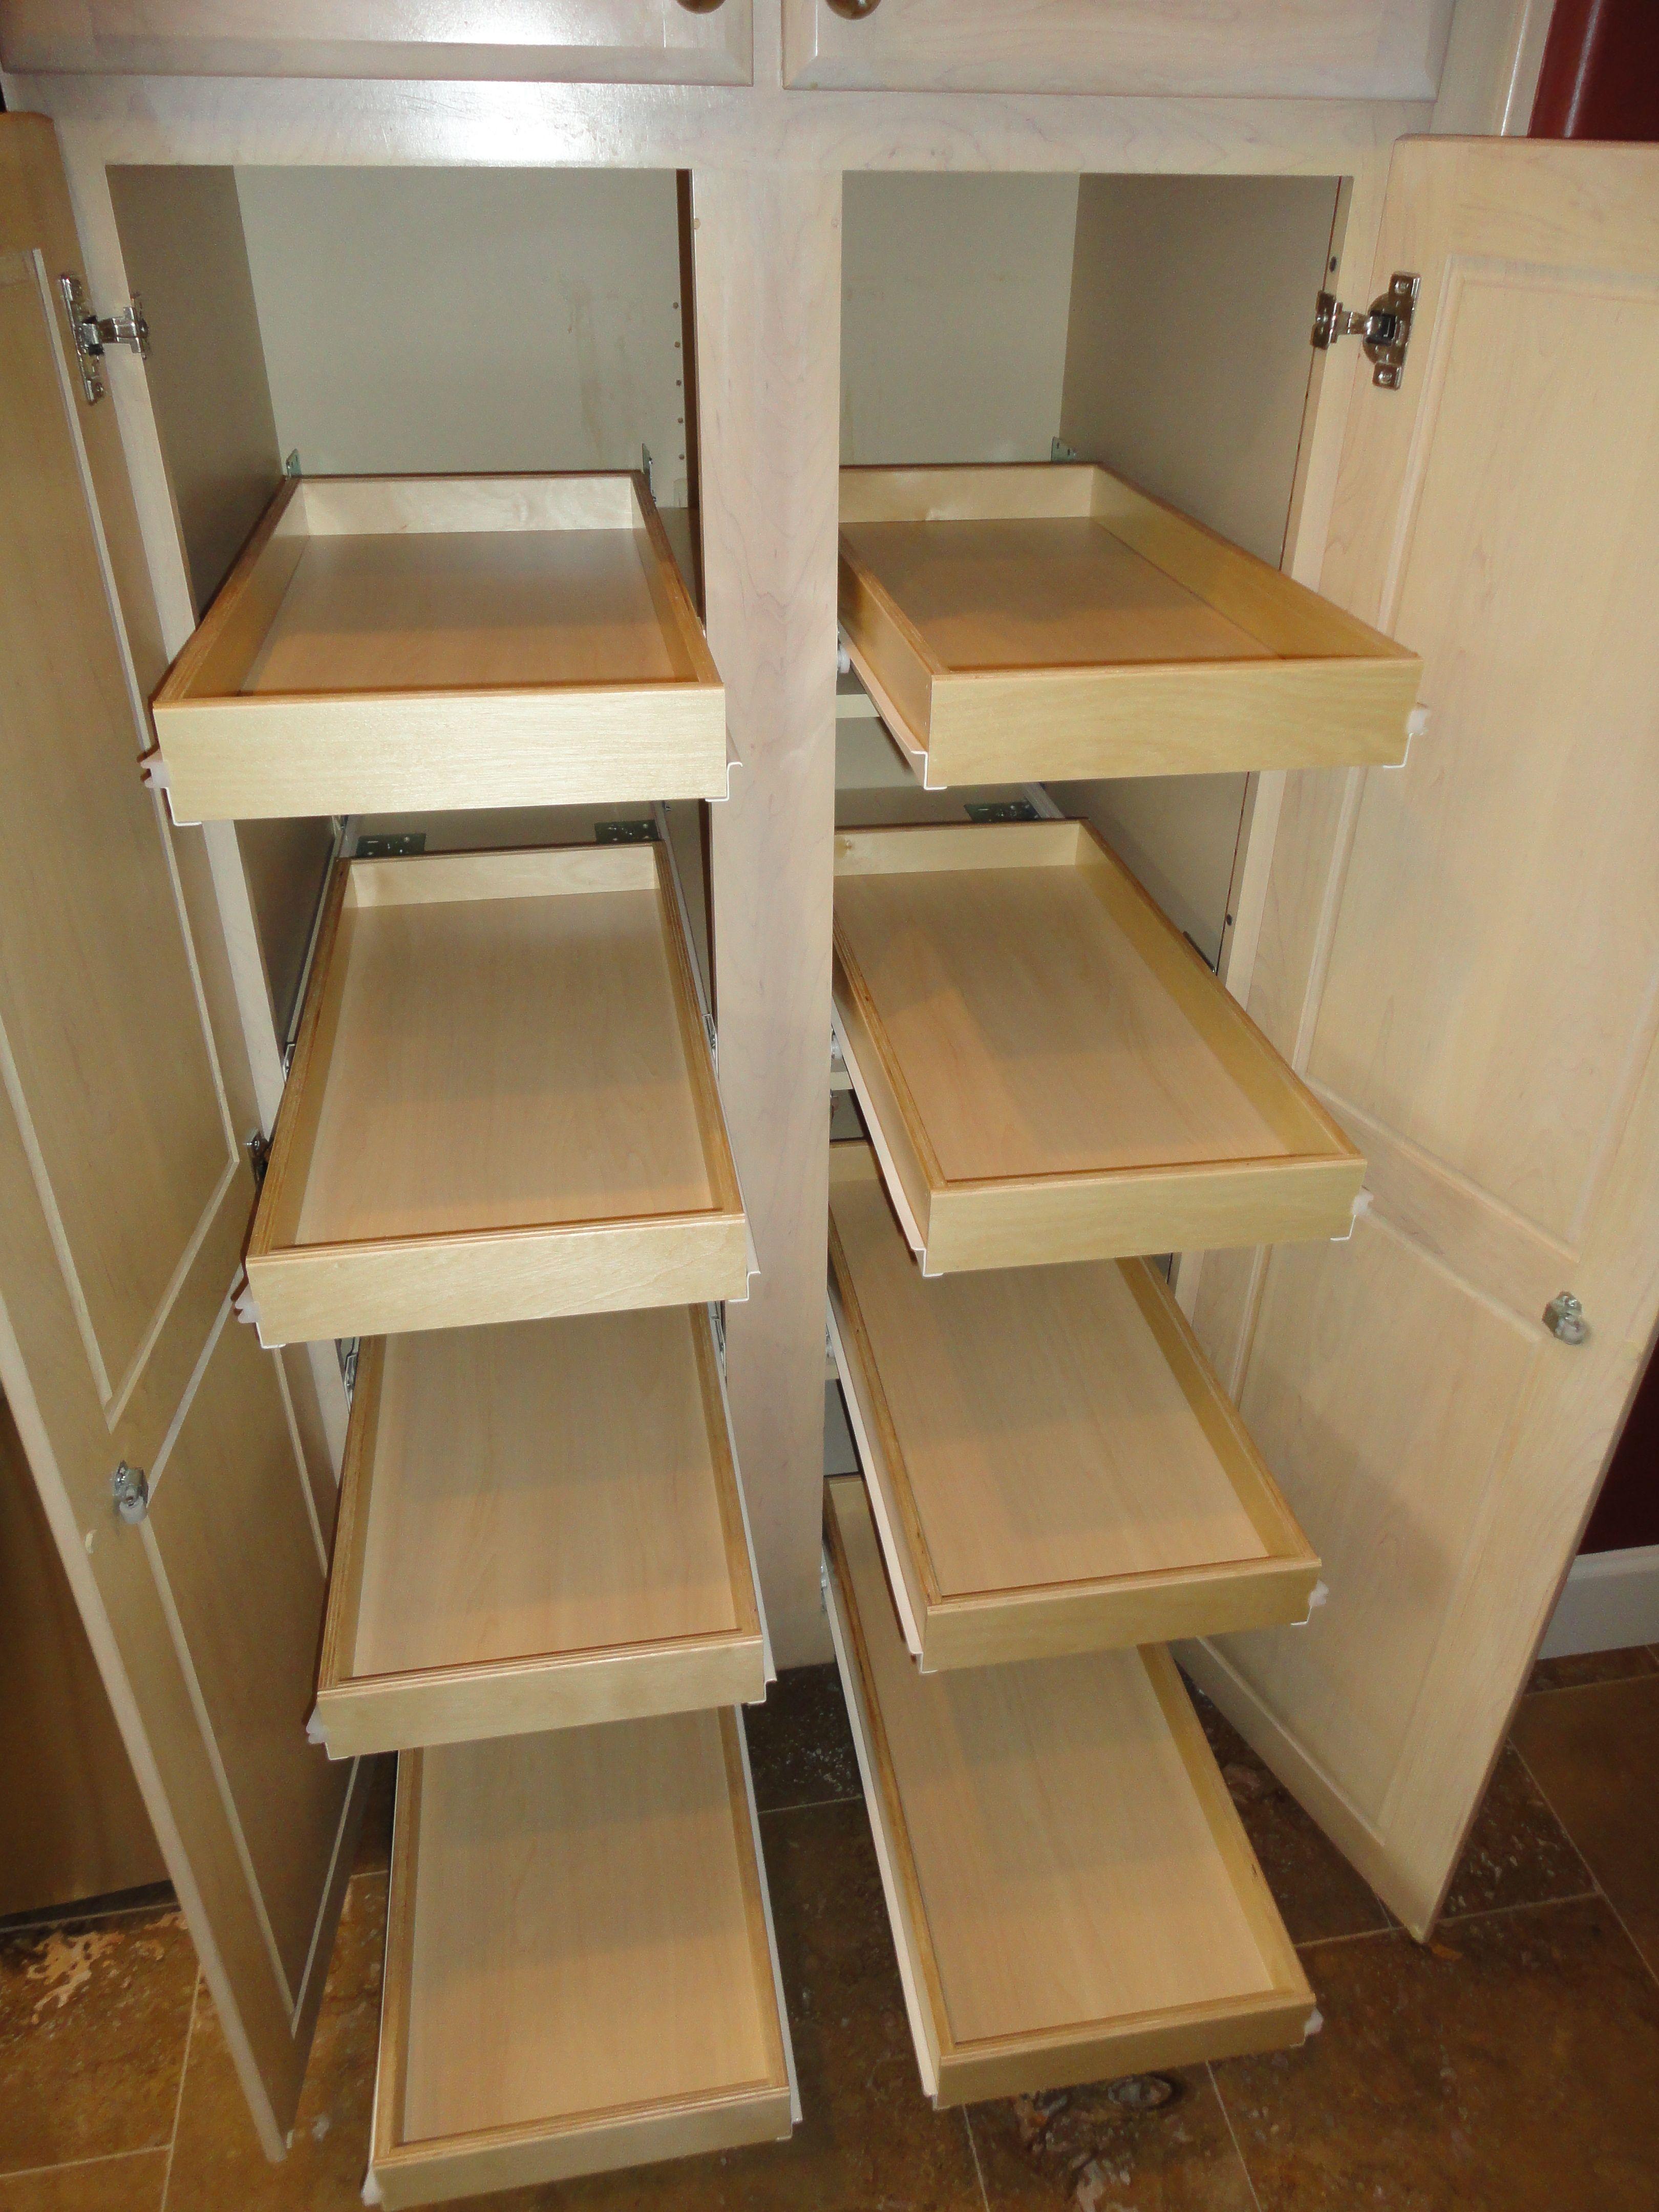 8 Slide Out Shelves Added To Pantry Cabinet Slide Out Shelves